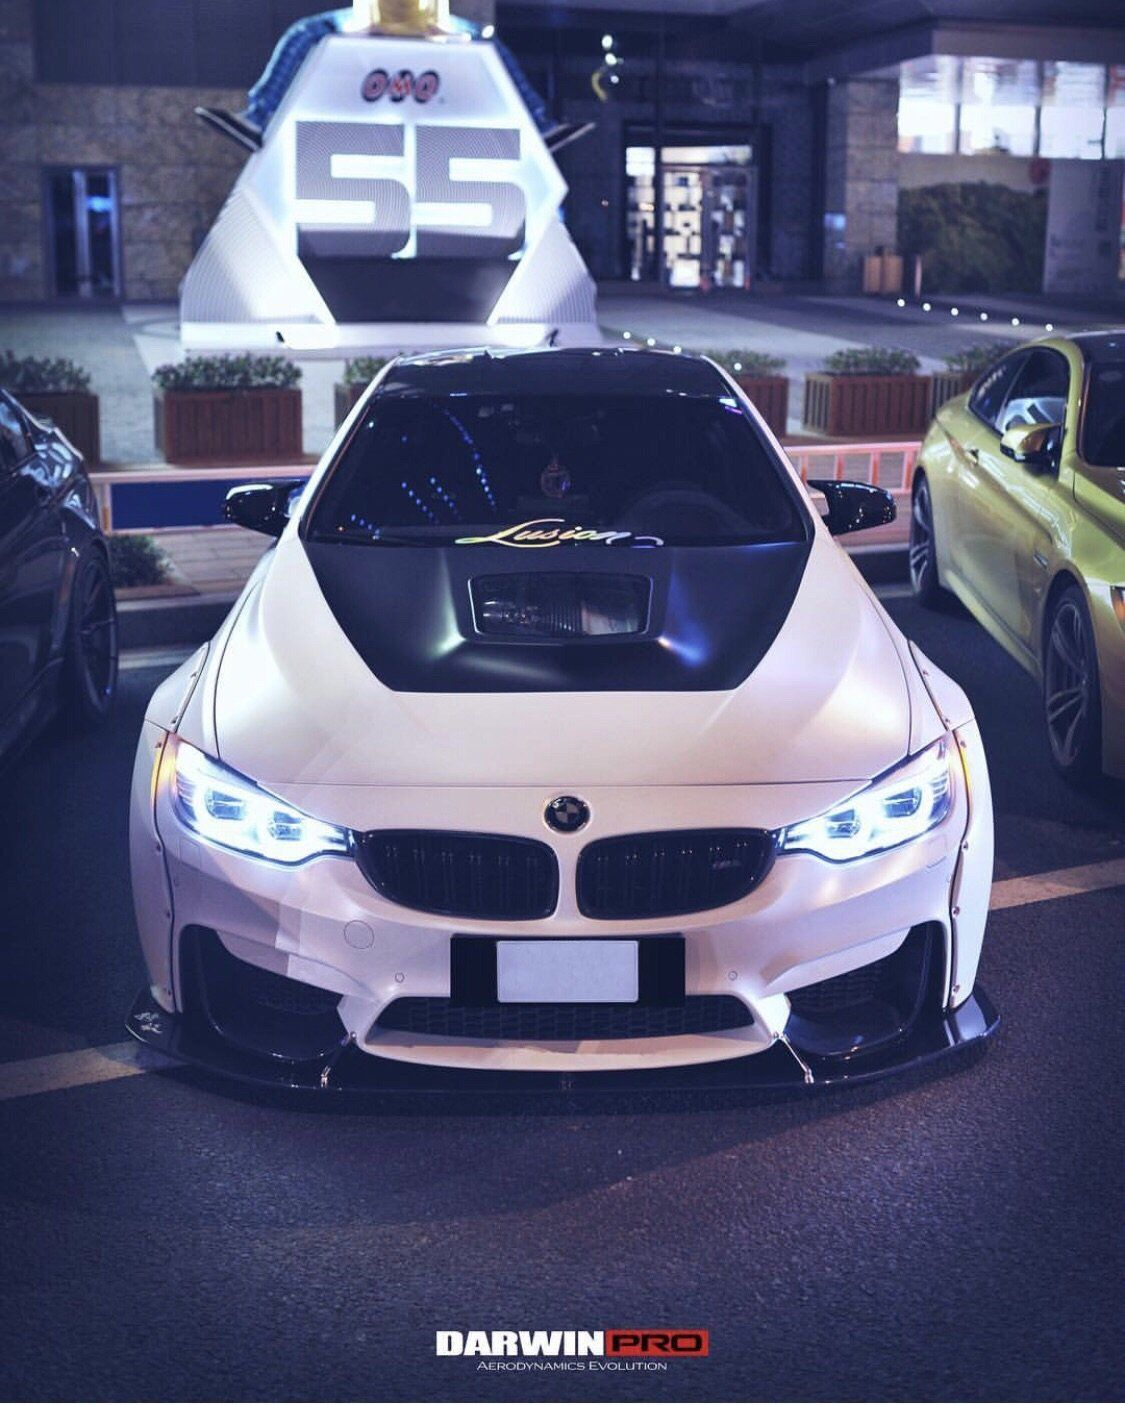 DarwinPRO BMW F80 M3 / F82 M4 IMP Style Carbon Fiber Hood